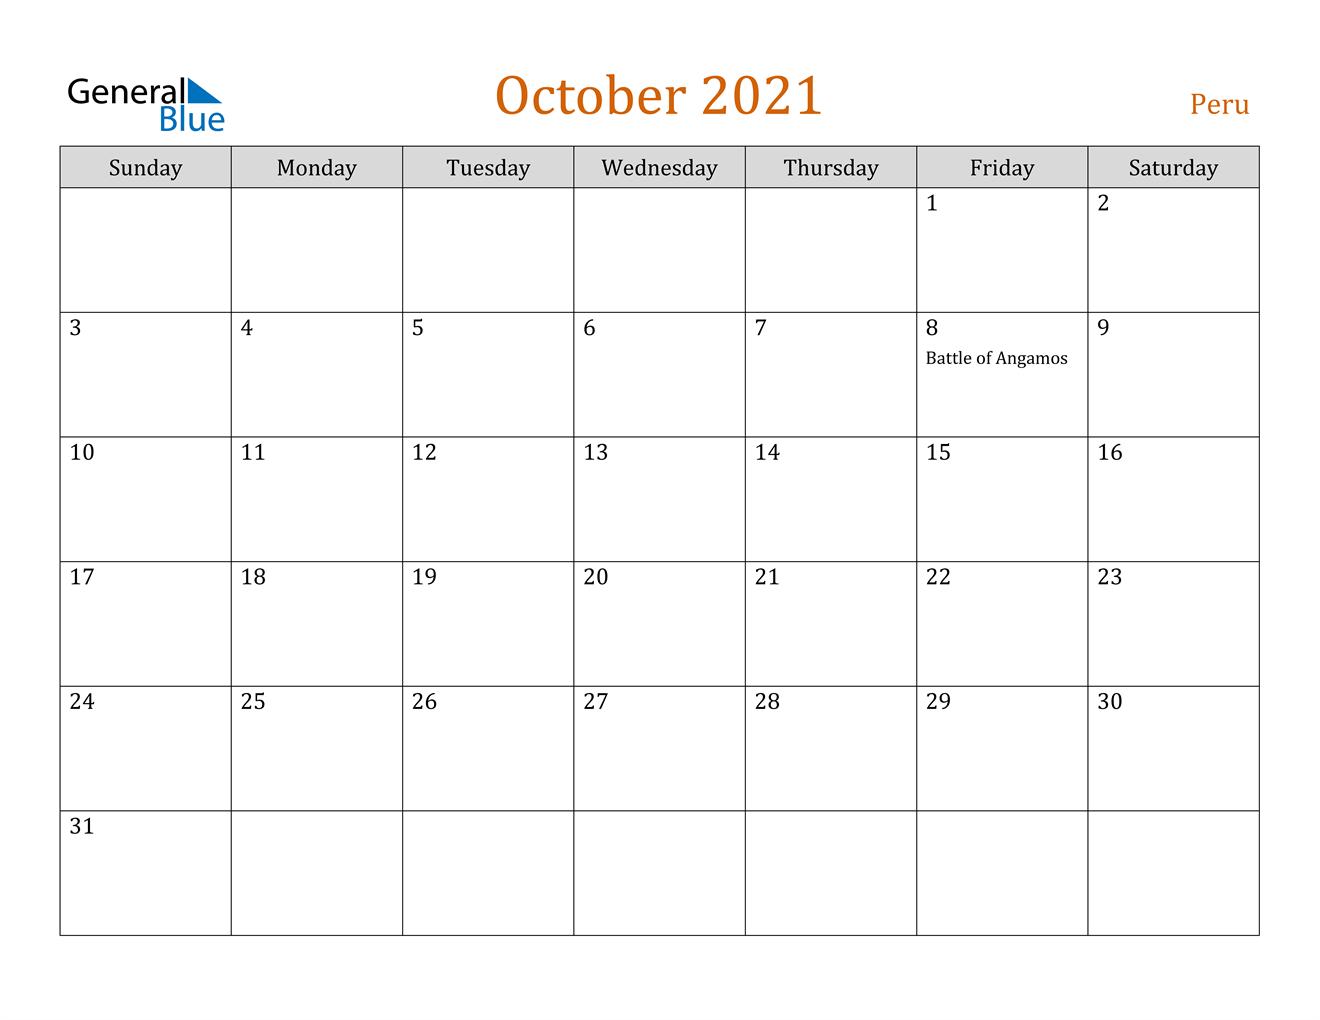 October 2021 Calendar - Peru